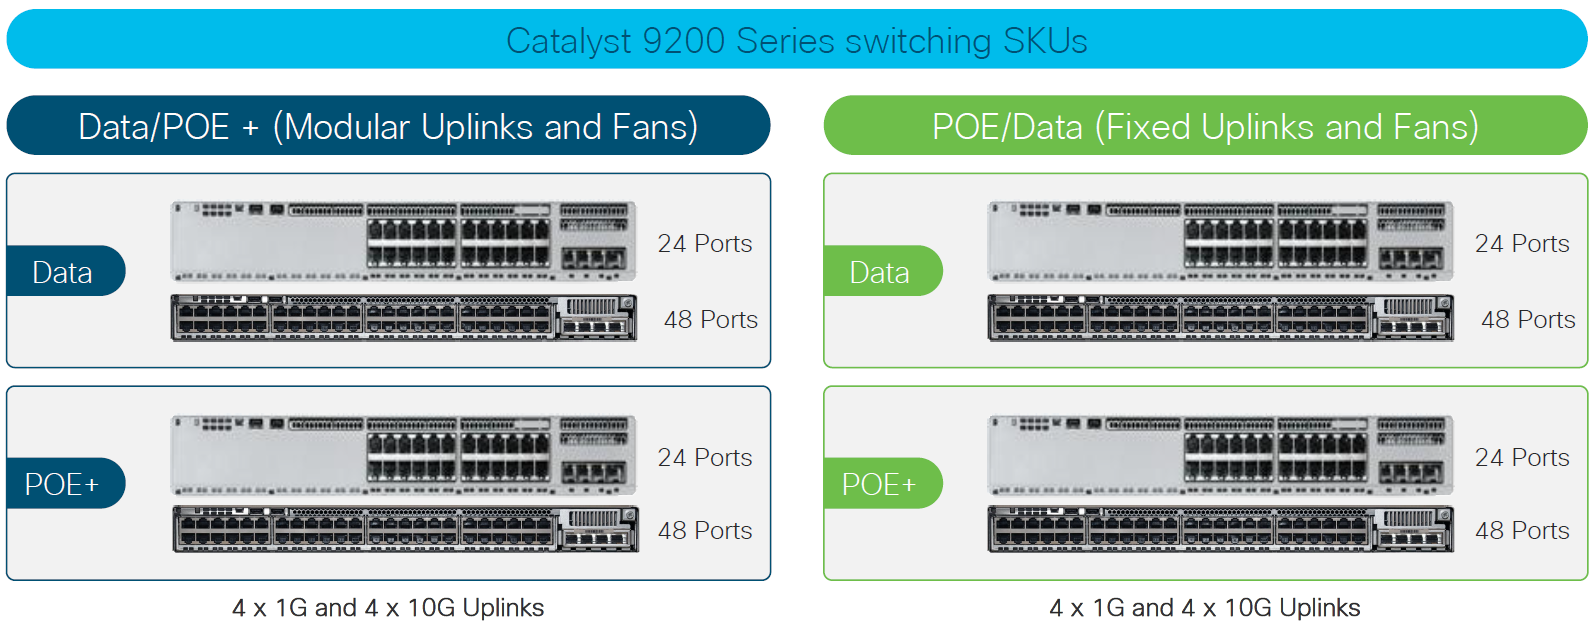 Catalyst 9200 Series Switching SKUs